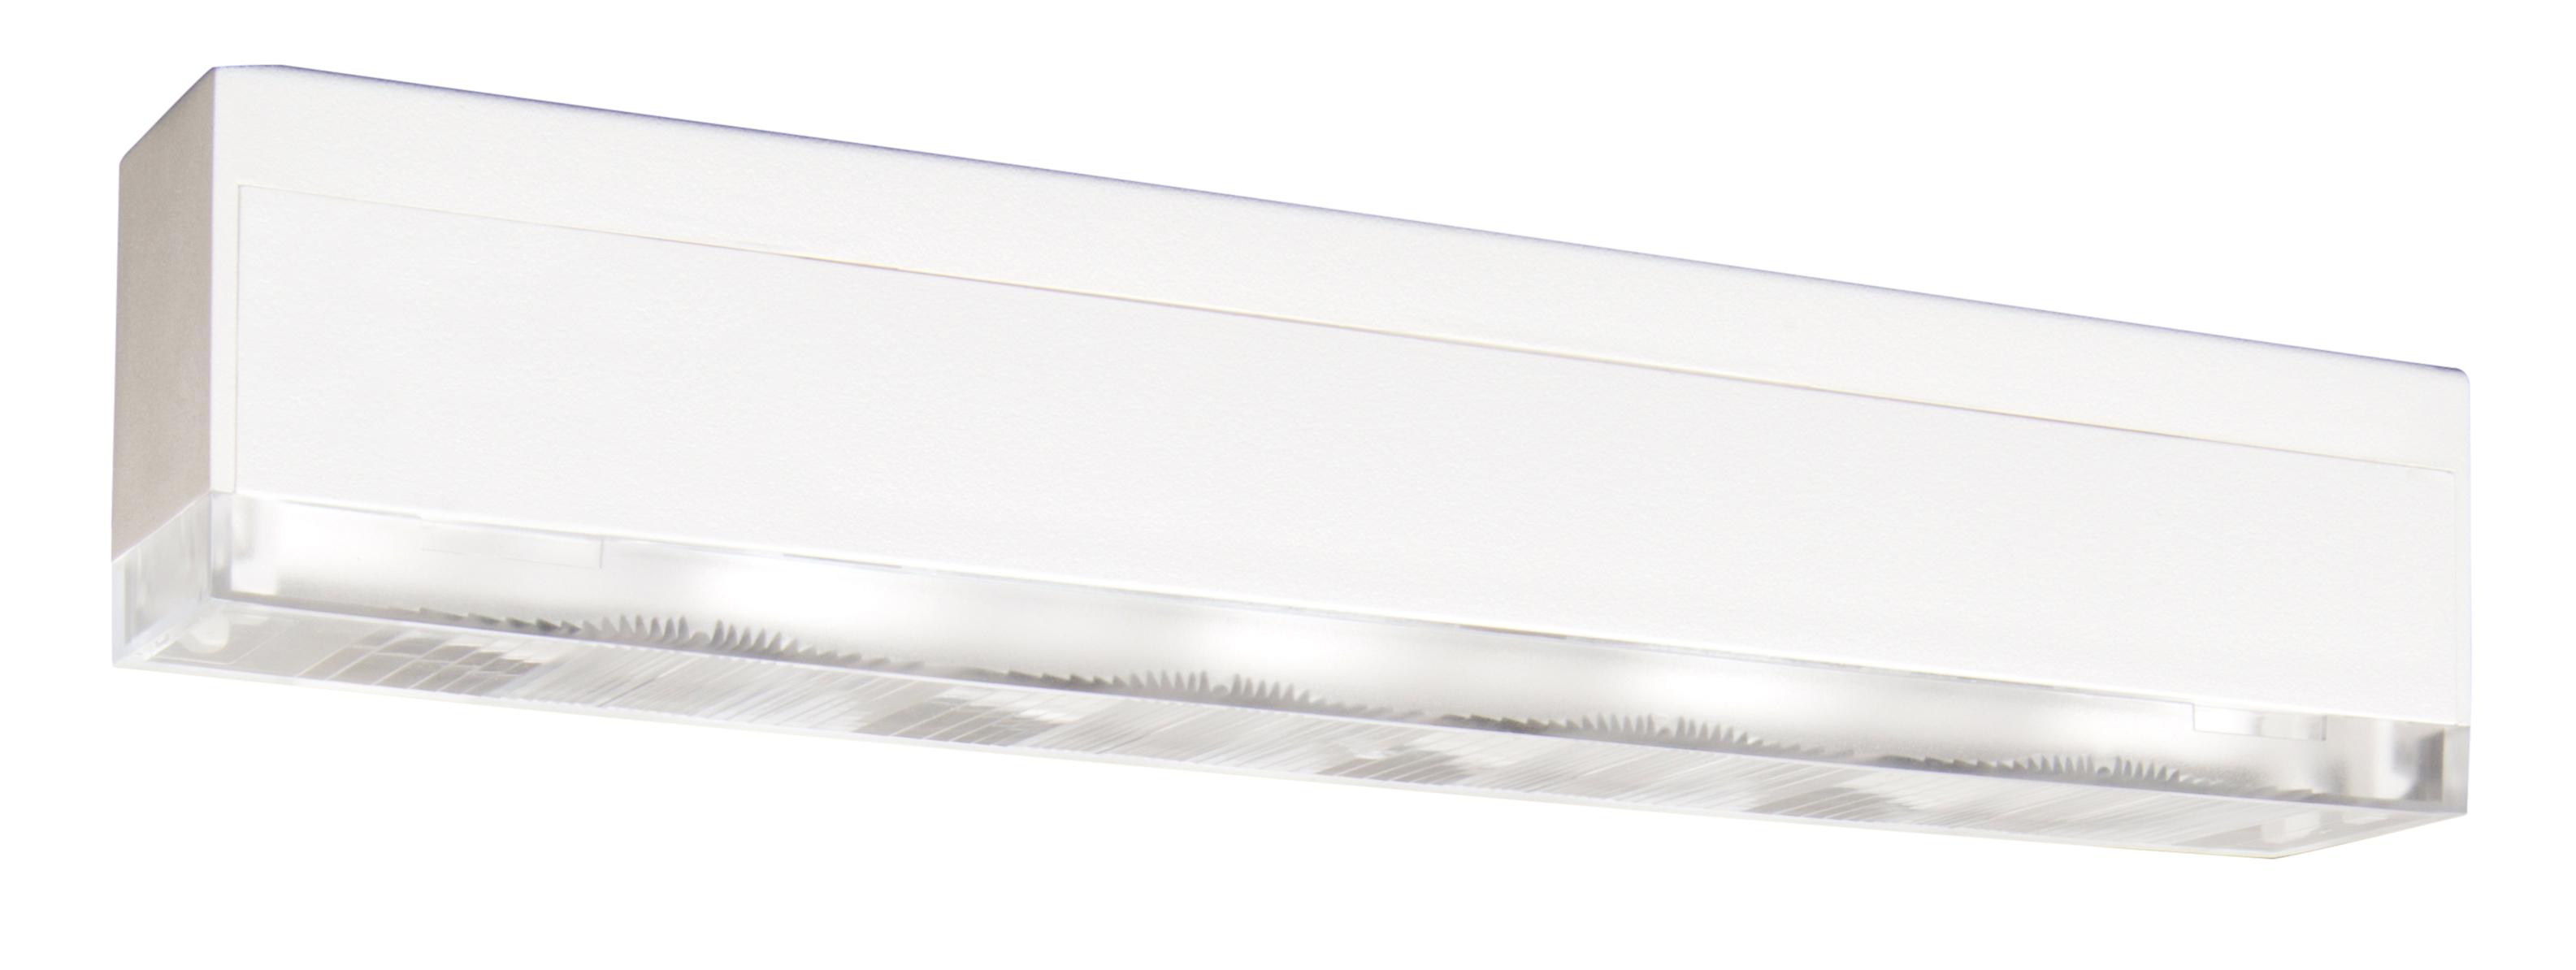 1 Stk Notleuchte KMB Überwachung und Mischbetrieb LED 230V NLKMB009ML